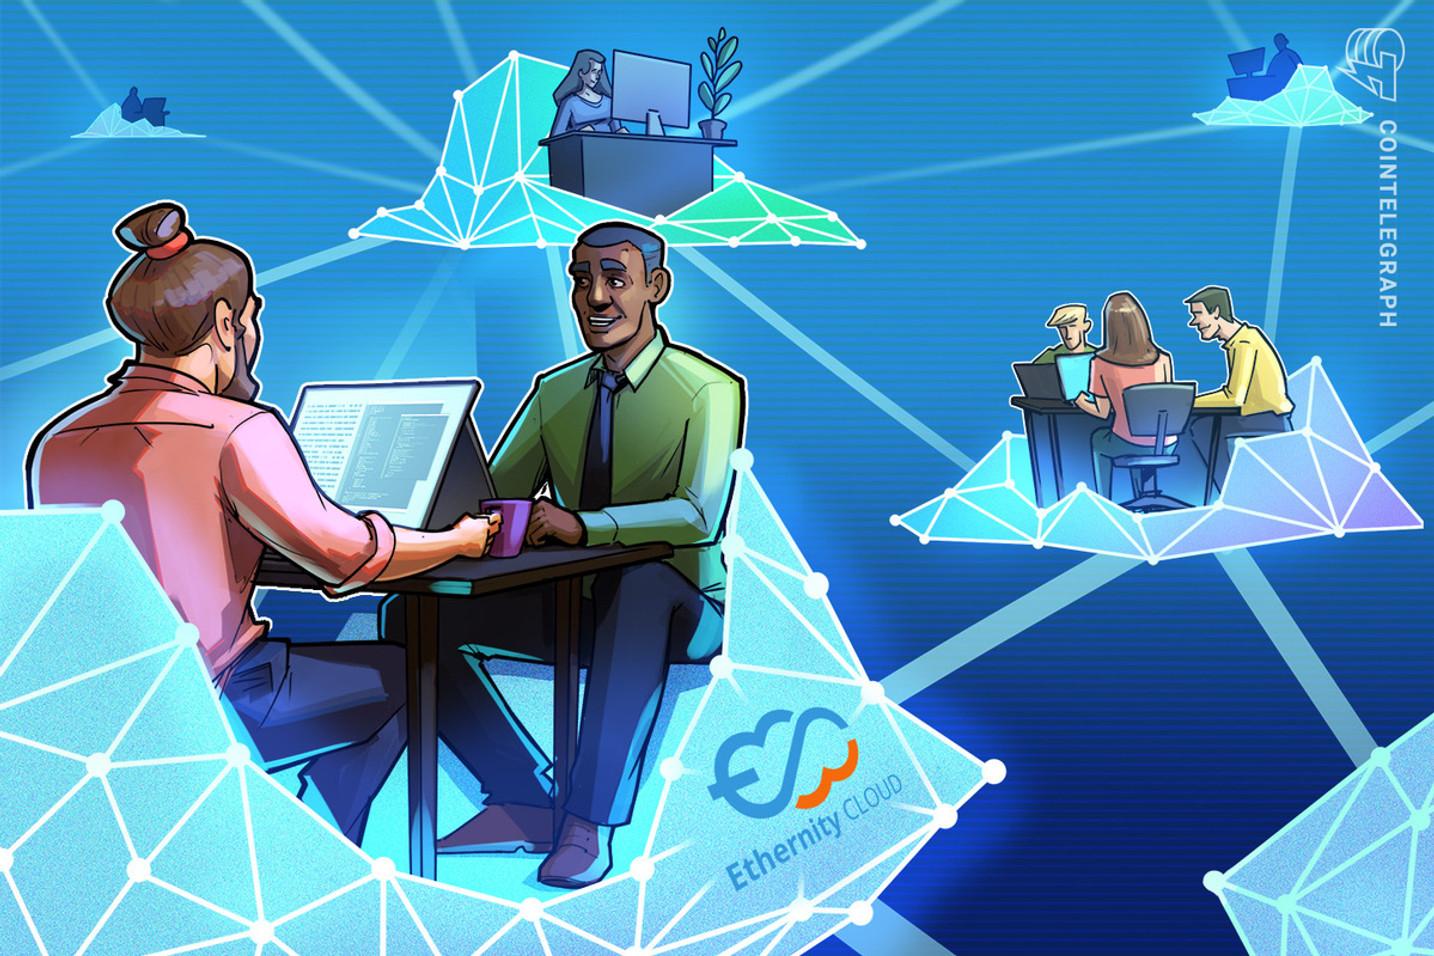 Decentralized cloud computing platform preserves internet privacy